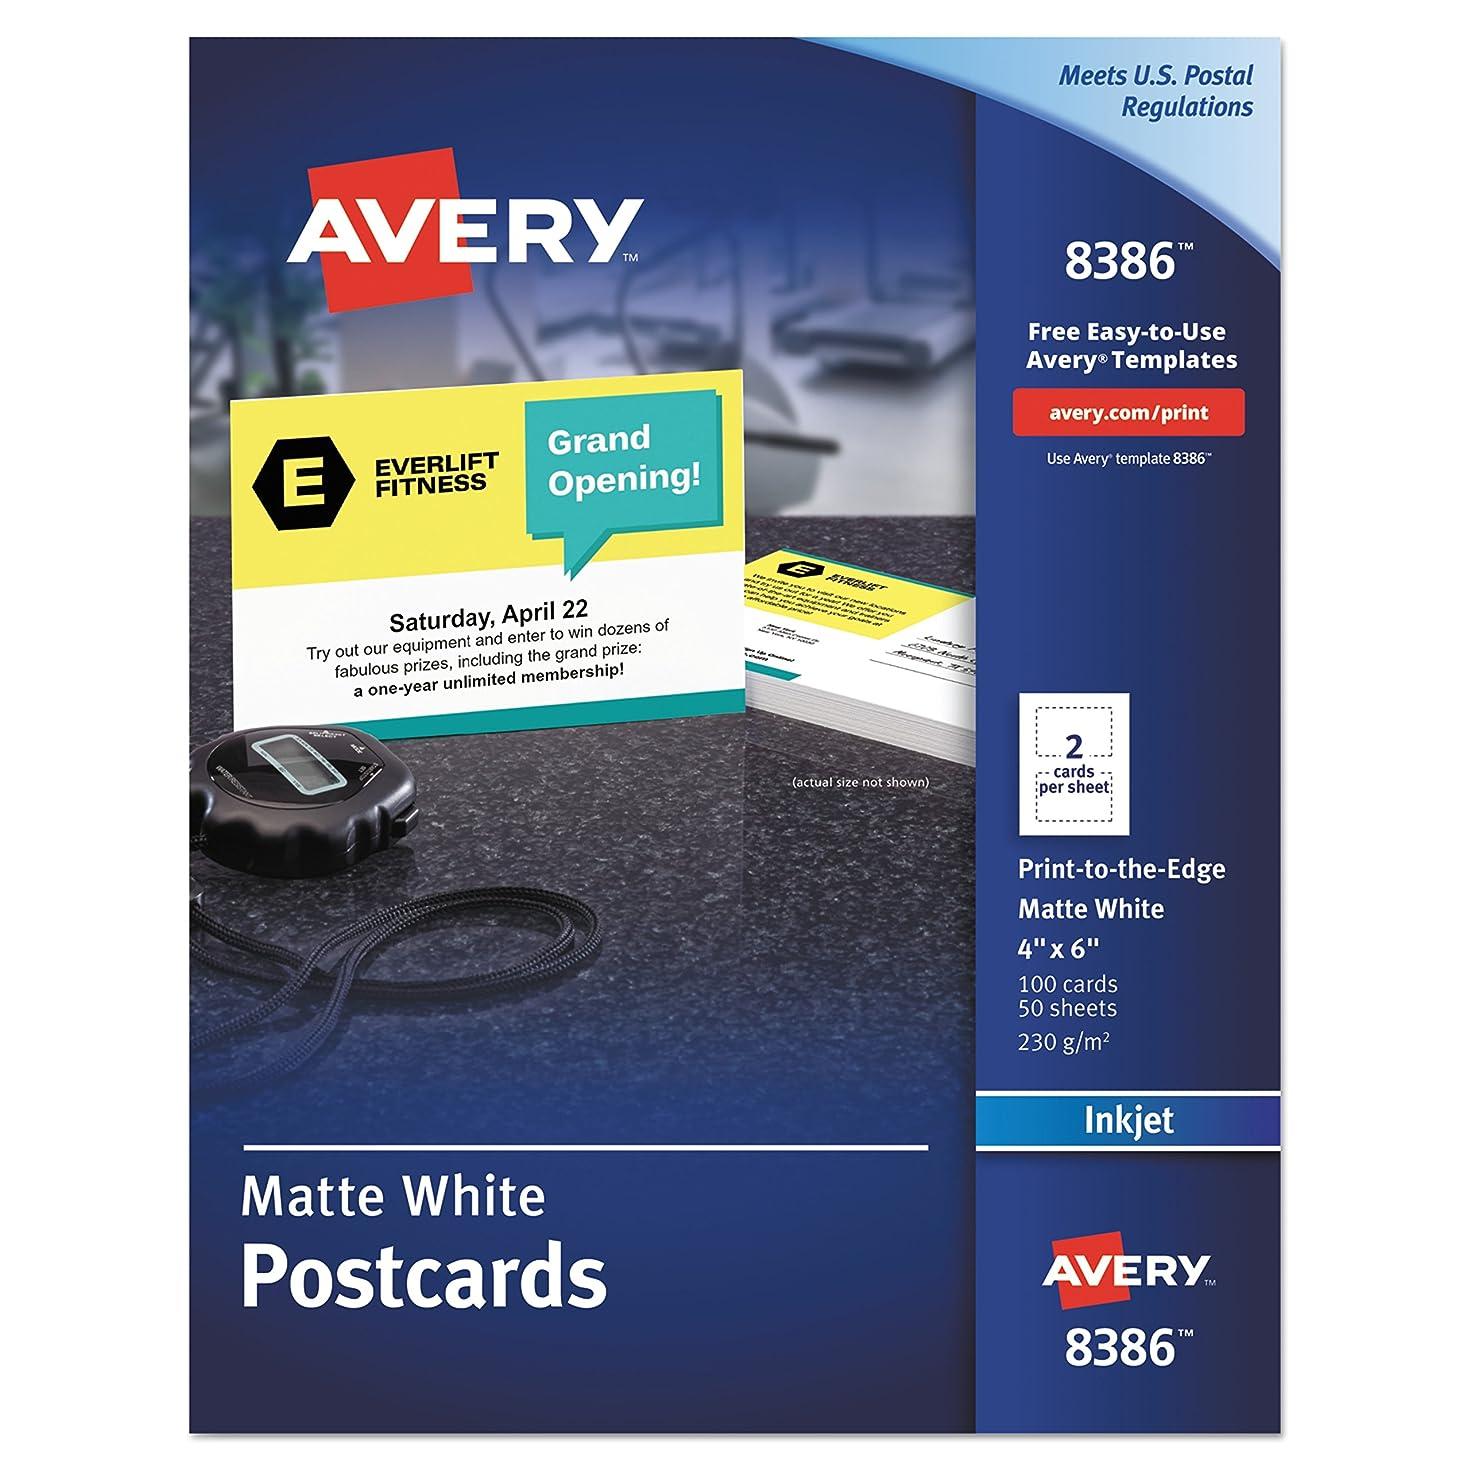 Avery 8386 Postcards, Inkjet, 4 x 6, 2 Cards/Sheet, White (Box of 100 Cards)